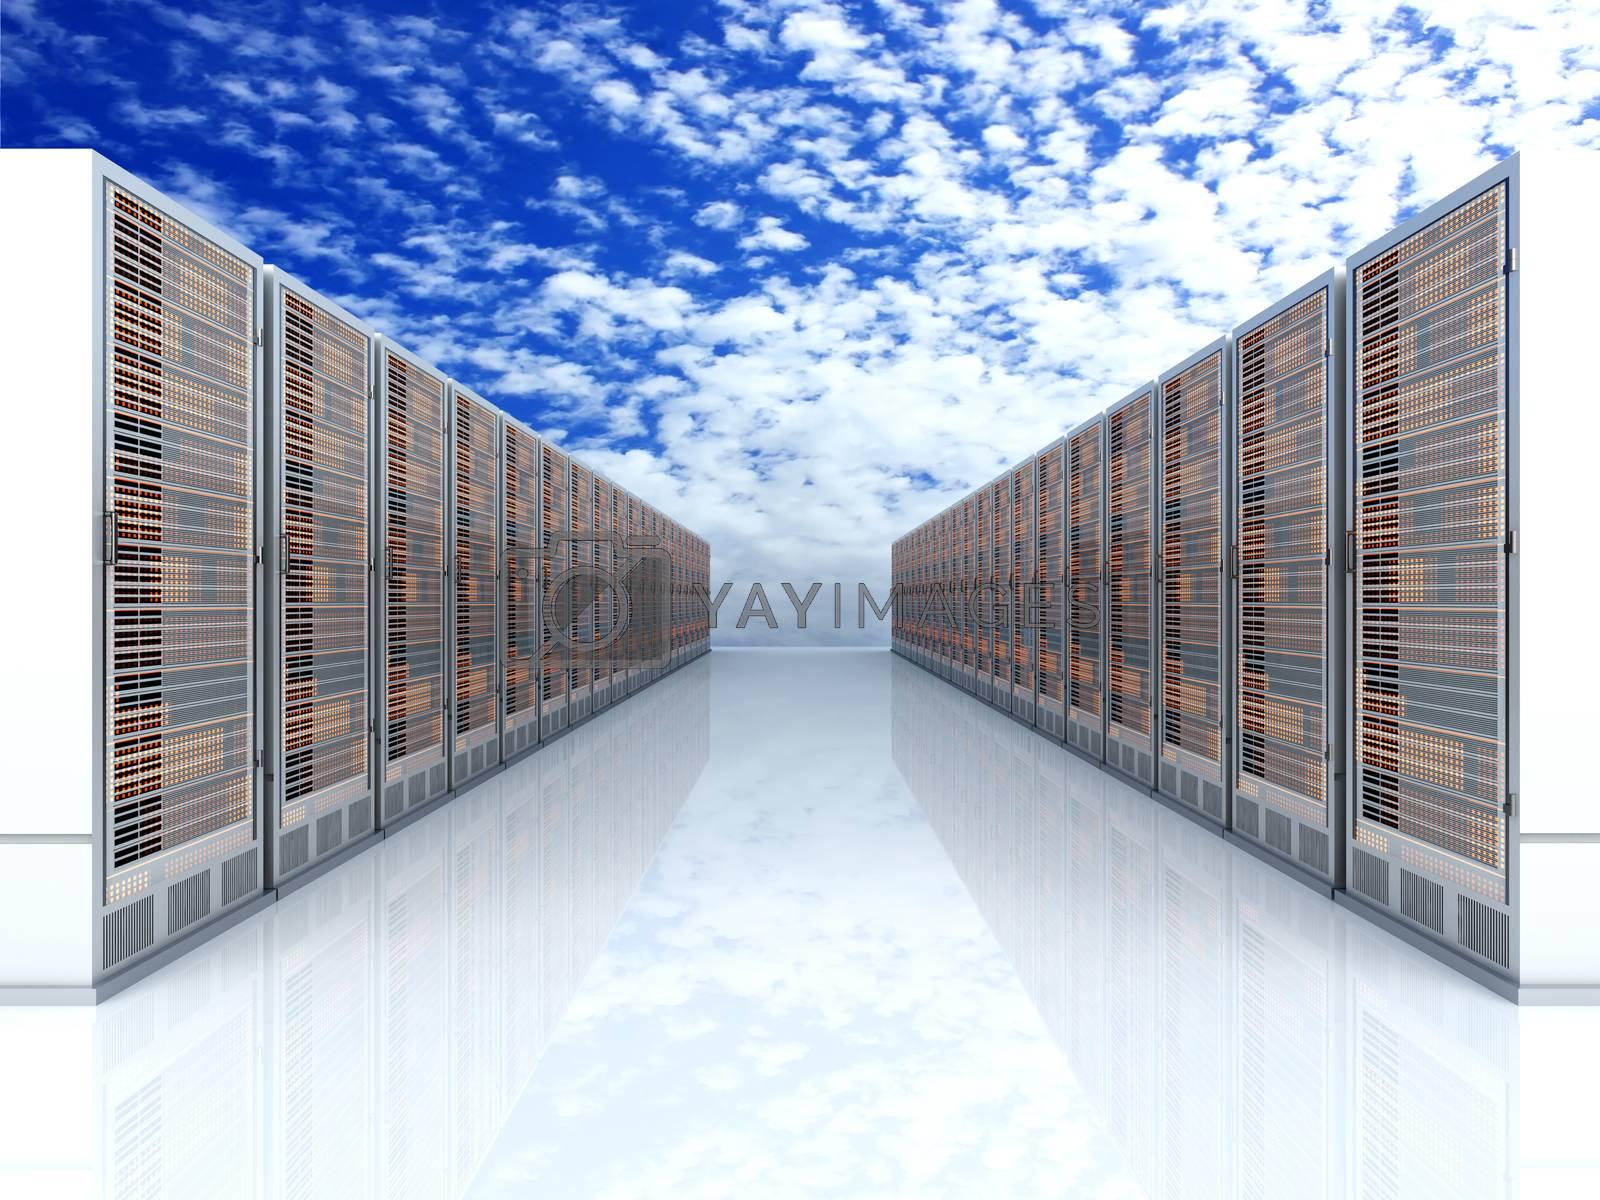 Server racks in a row. 3d illustration.